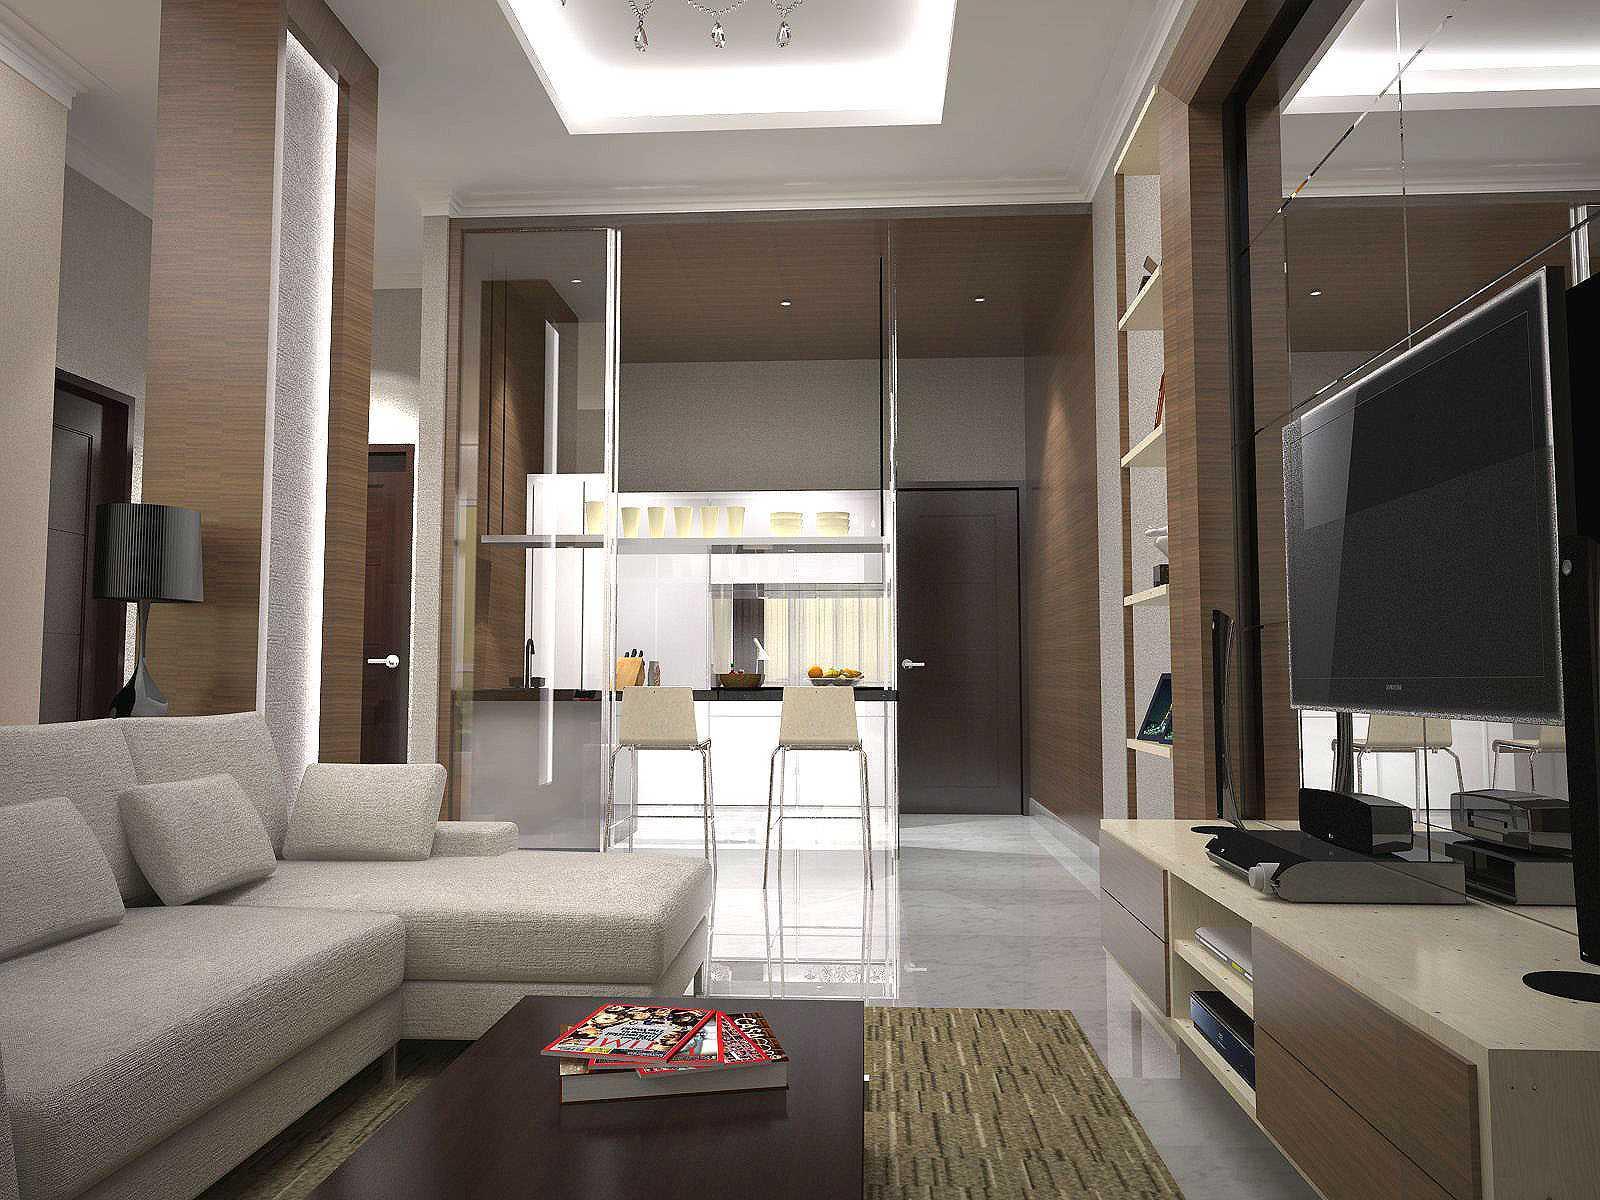 Pt. Garisprada Residences 8 Apartment Residence 8, Senopati, Jakarta Residence 8, Senopati, Jakarta Living Room Modern  25486